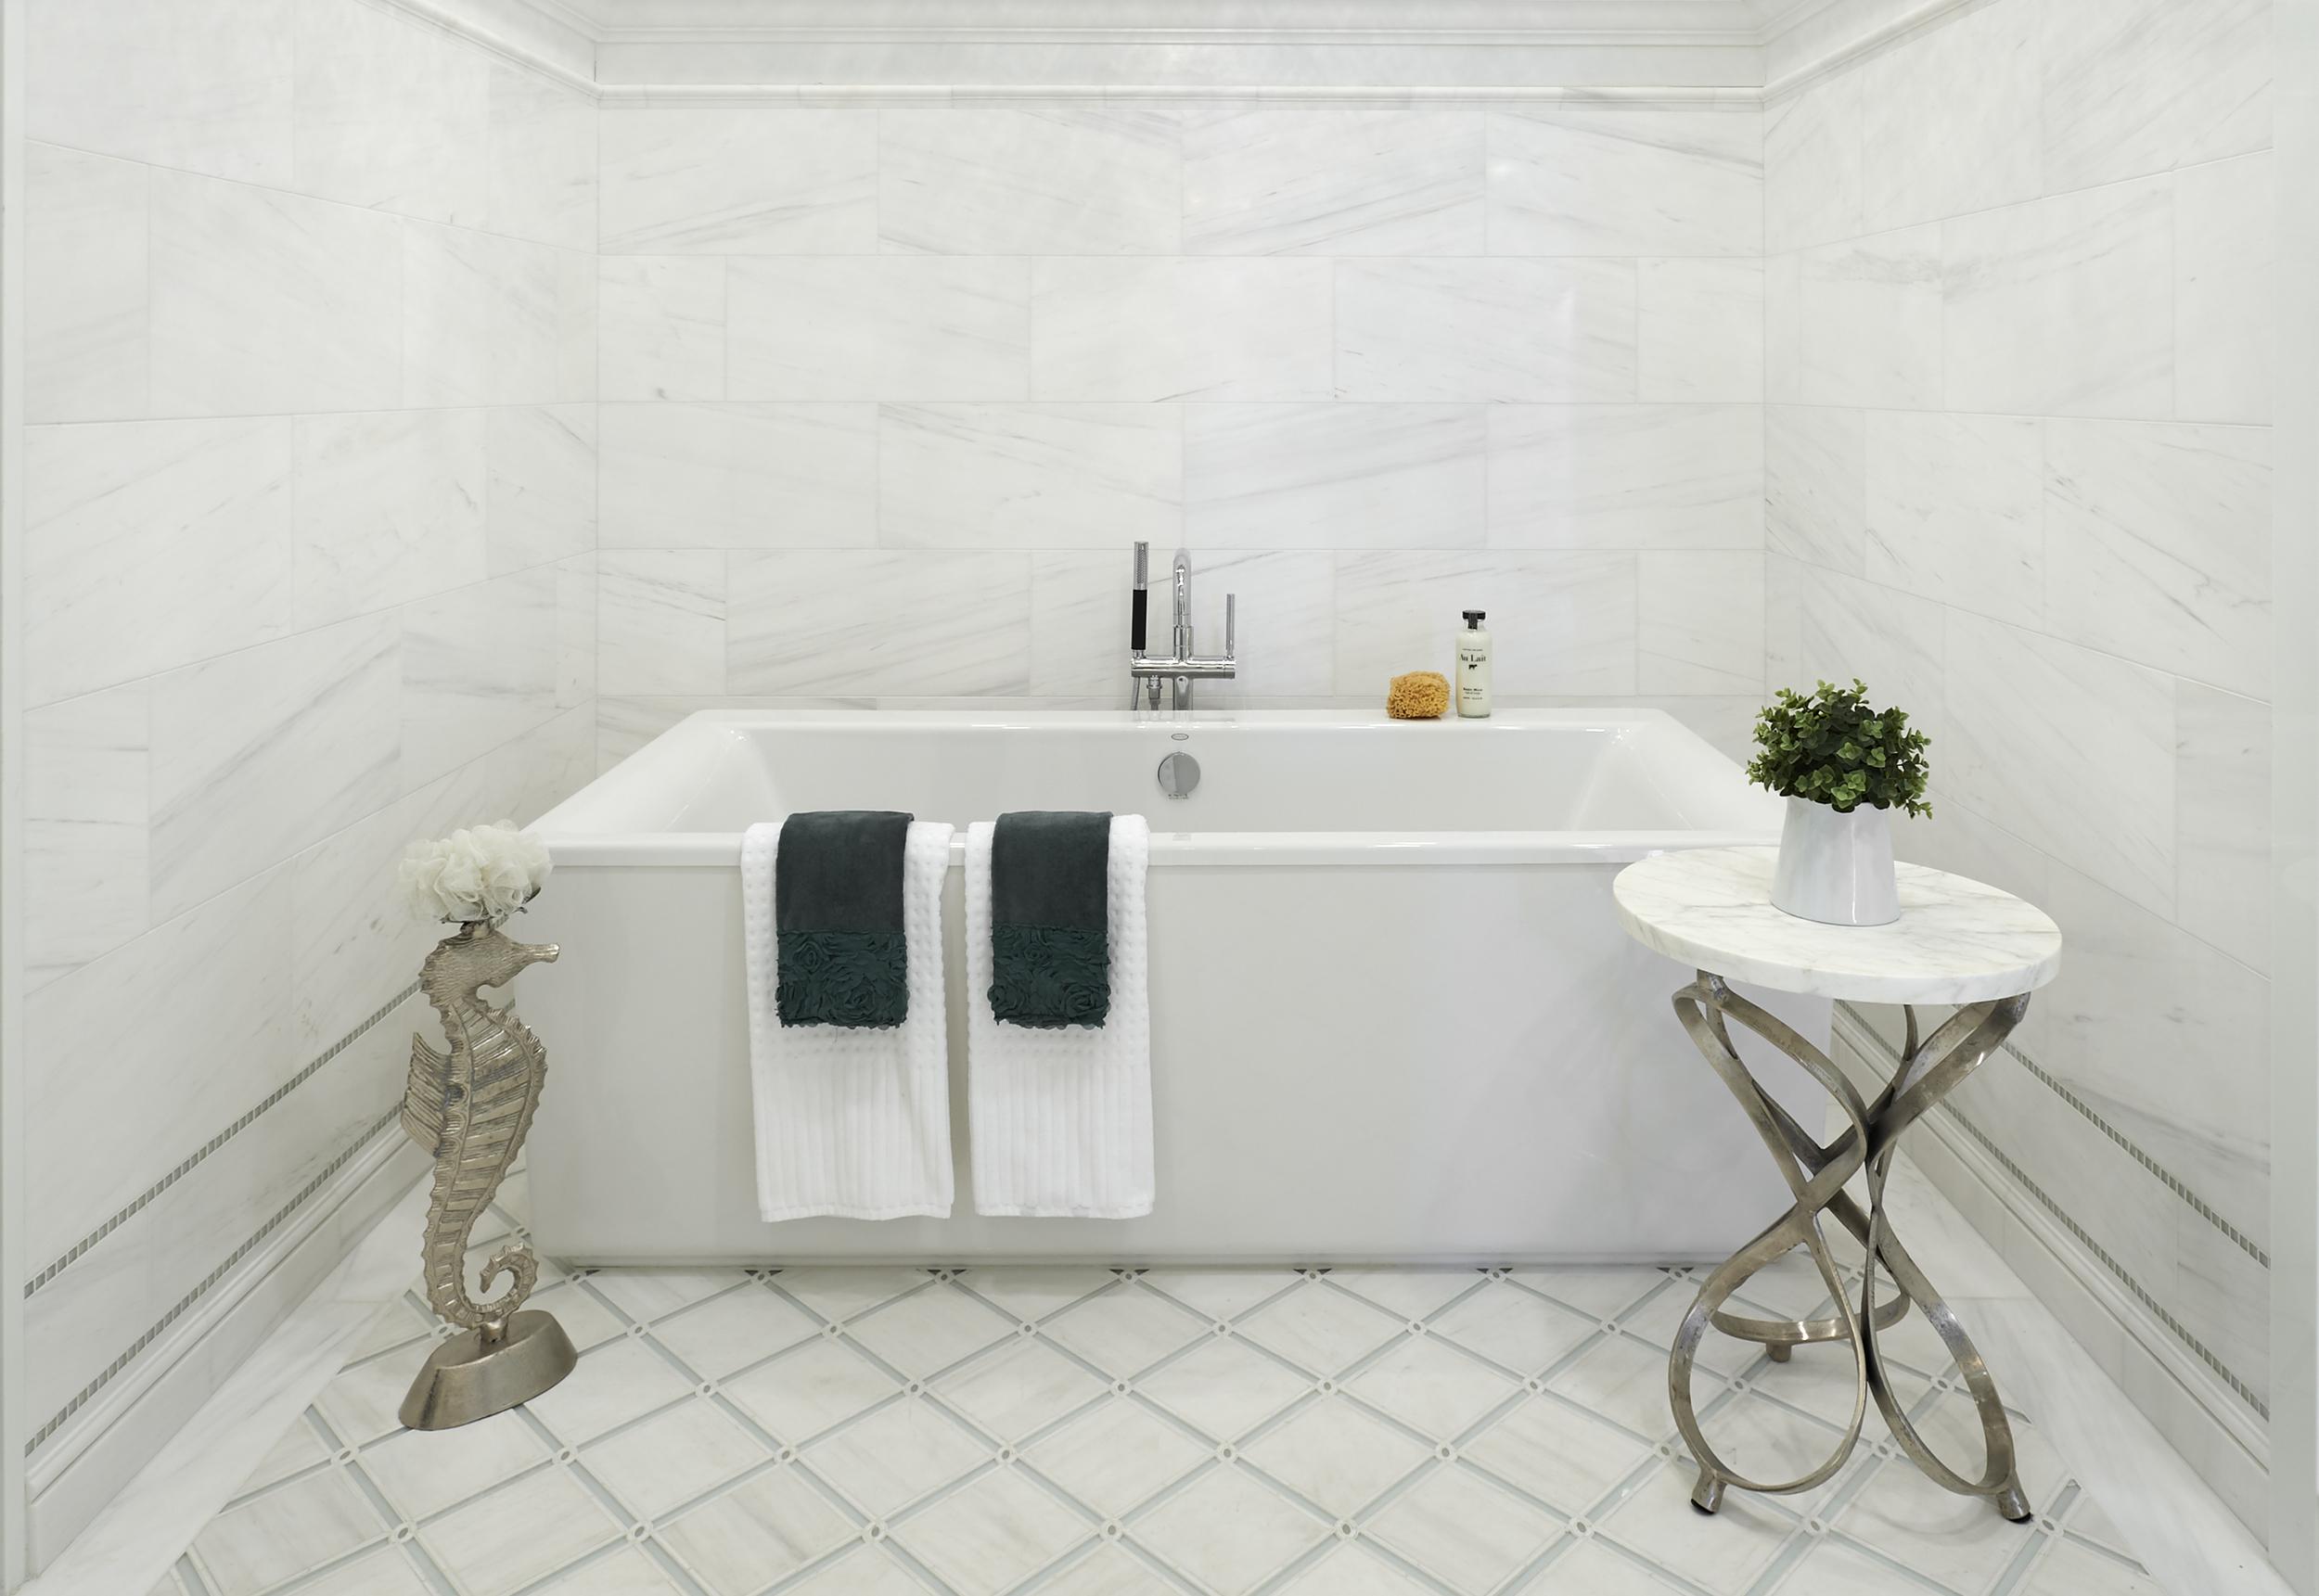 Showroom_01 tub.jpg